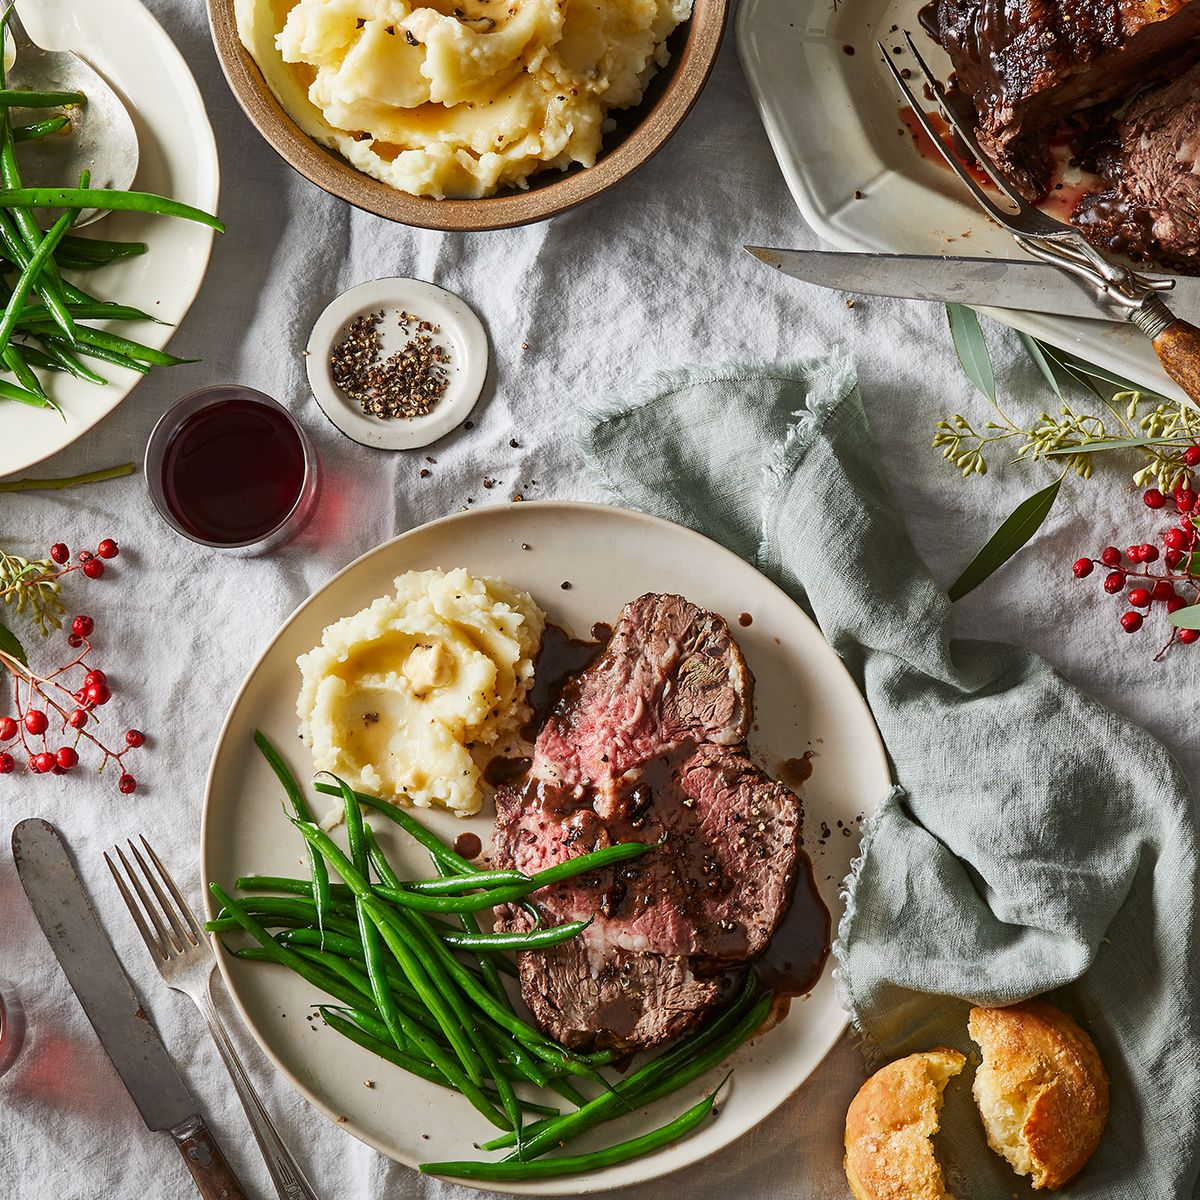 The Best Prime Rib Recipe Stars In This Easy Christmas Dinner Menu